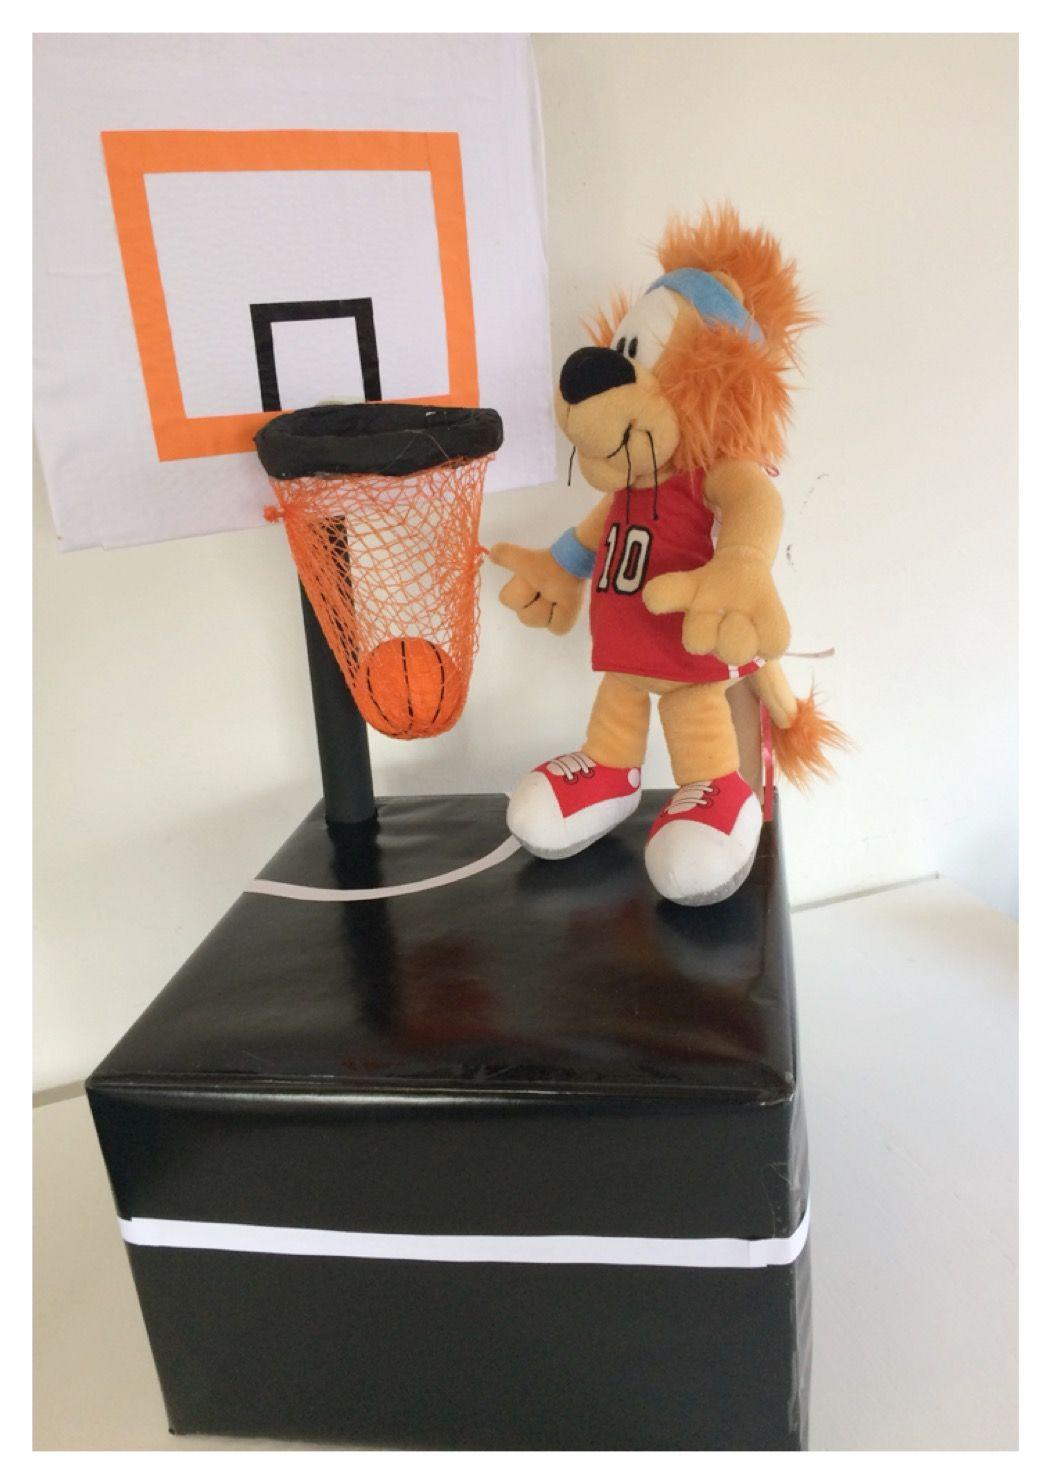 Sinterklaas surprise Basketbal basketballer www.sinterklaassurprises.jouwweb.nl